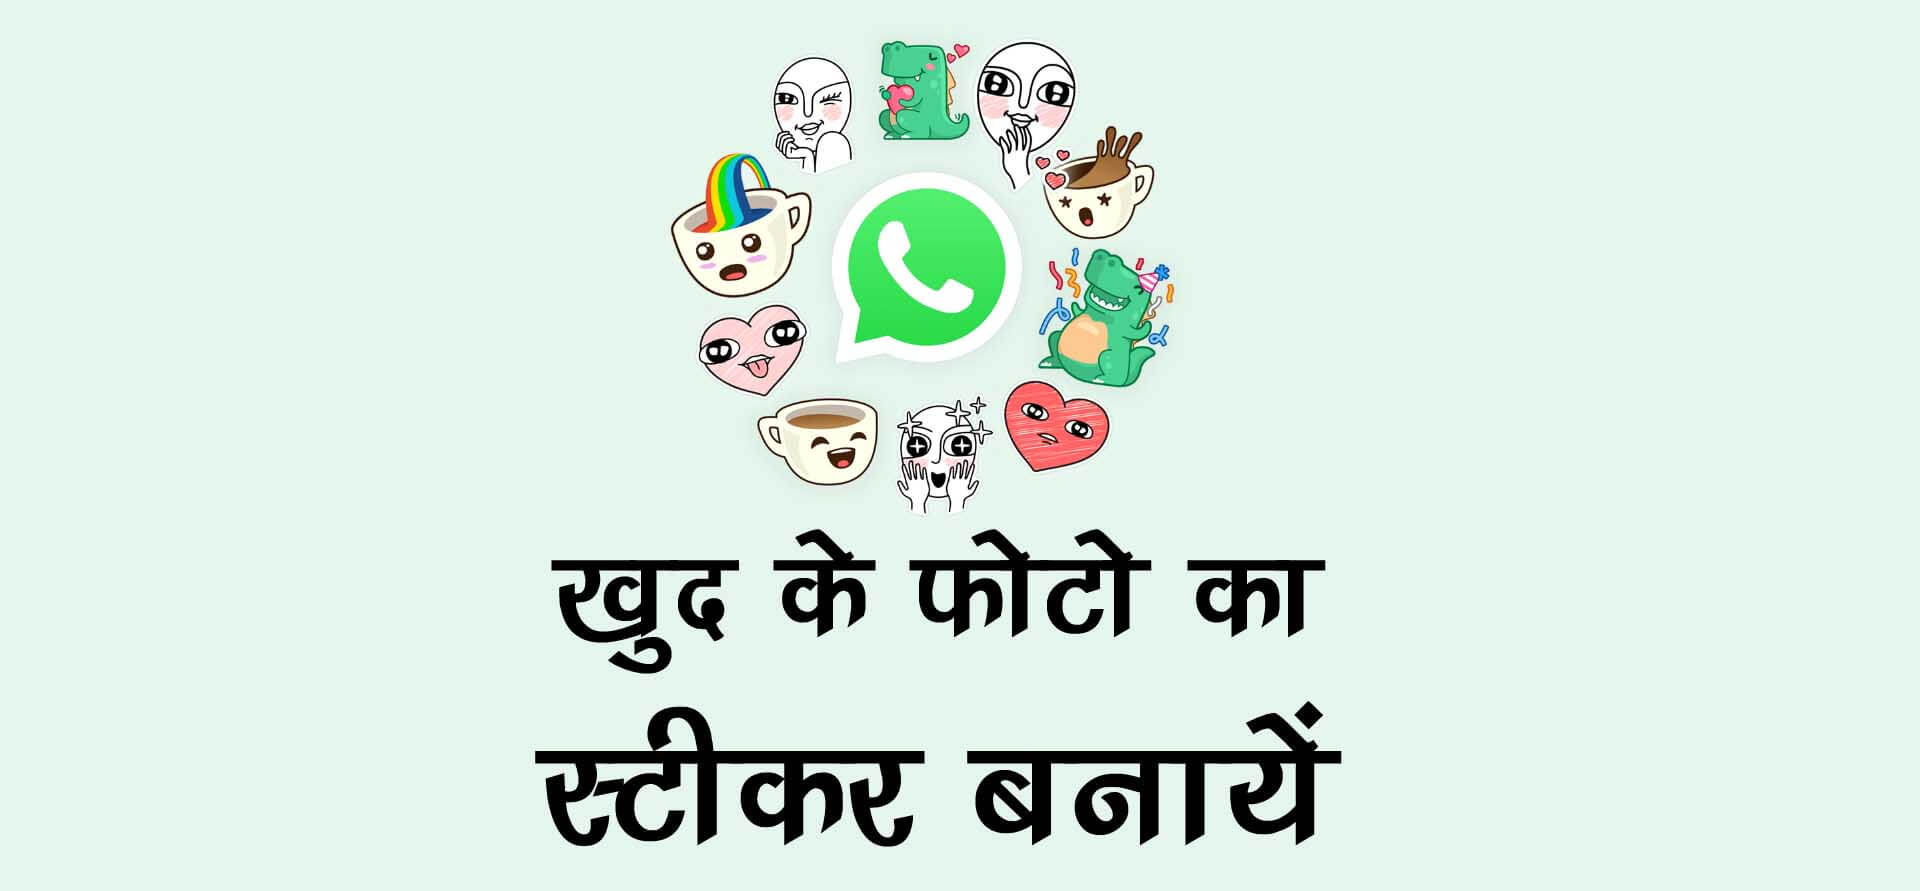 whatsapp sticker kaise banaye